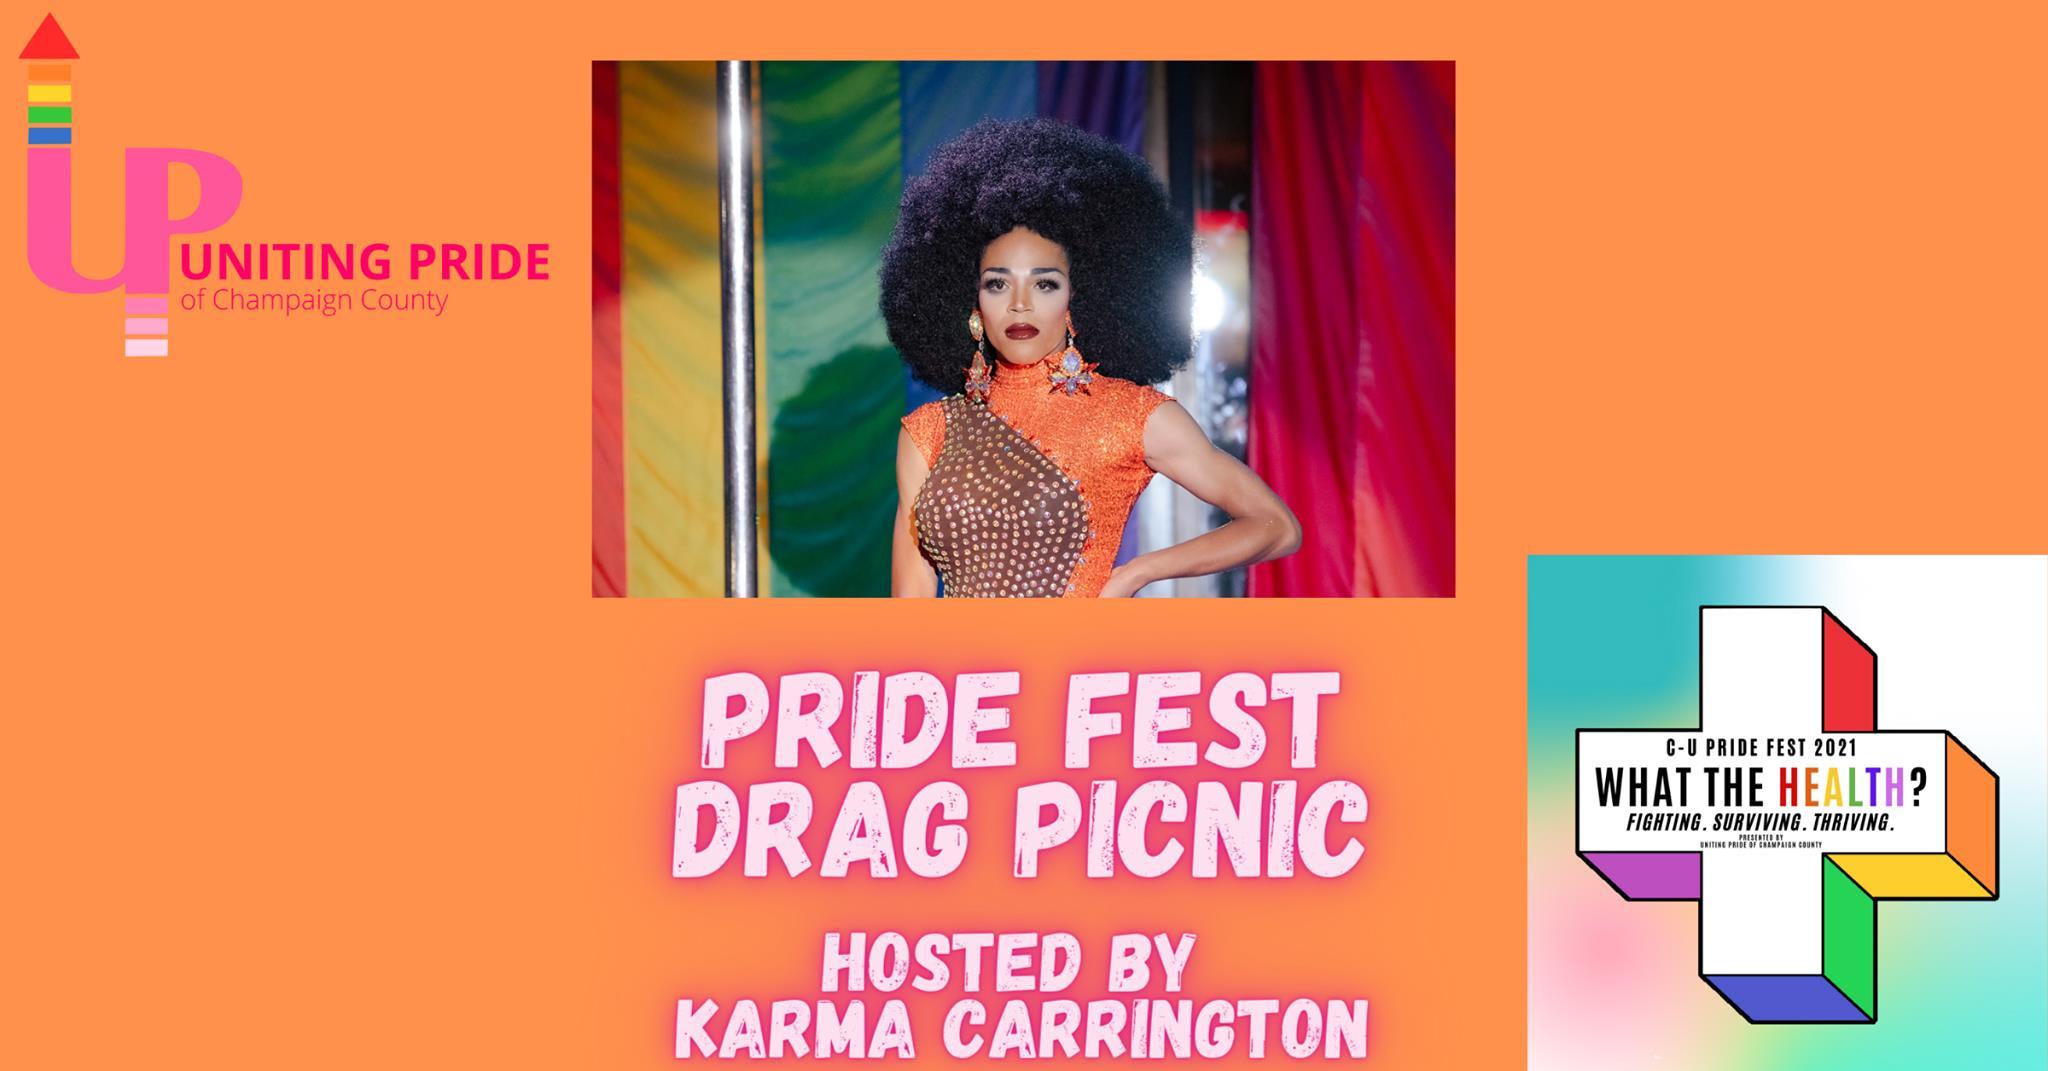 Pride Fest Drag Picnic